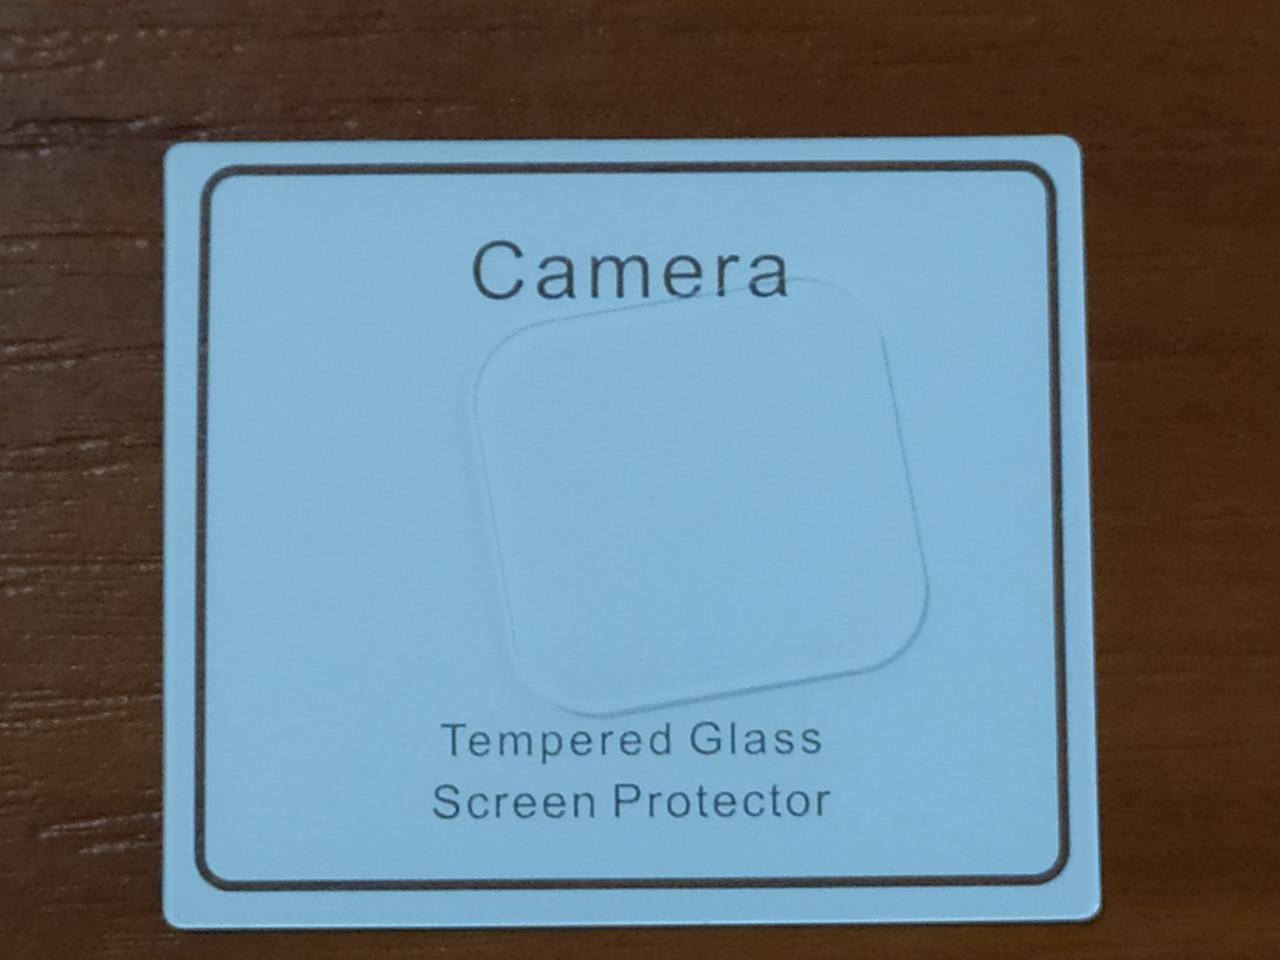 Защитное стекло на камеру Tempered Glass Screen Protector  Xiaomi Redmi 9C